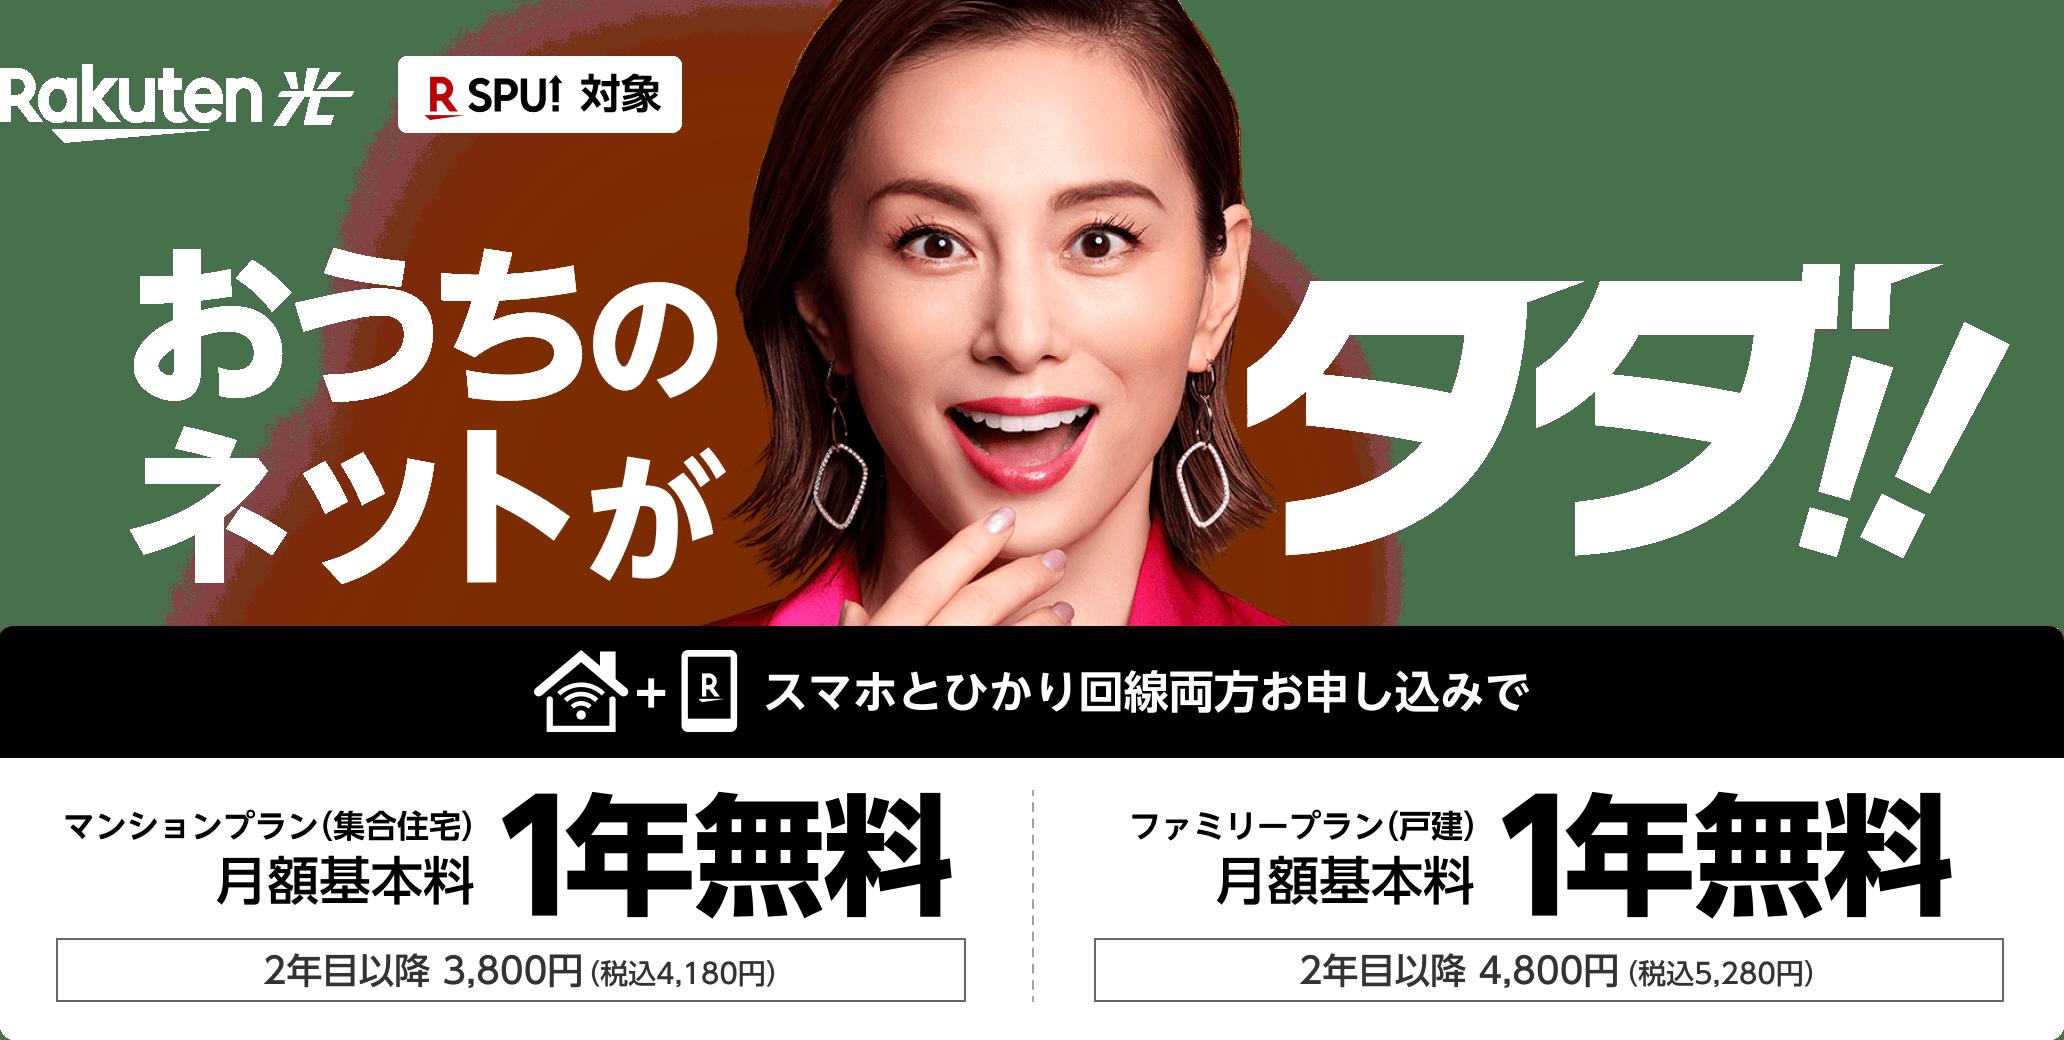 https://network.mobile.rakuten.co.jp/assets/img/campaign/hikari/hero-pc.png?201228